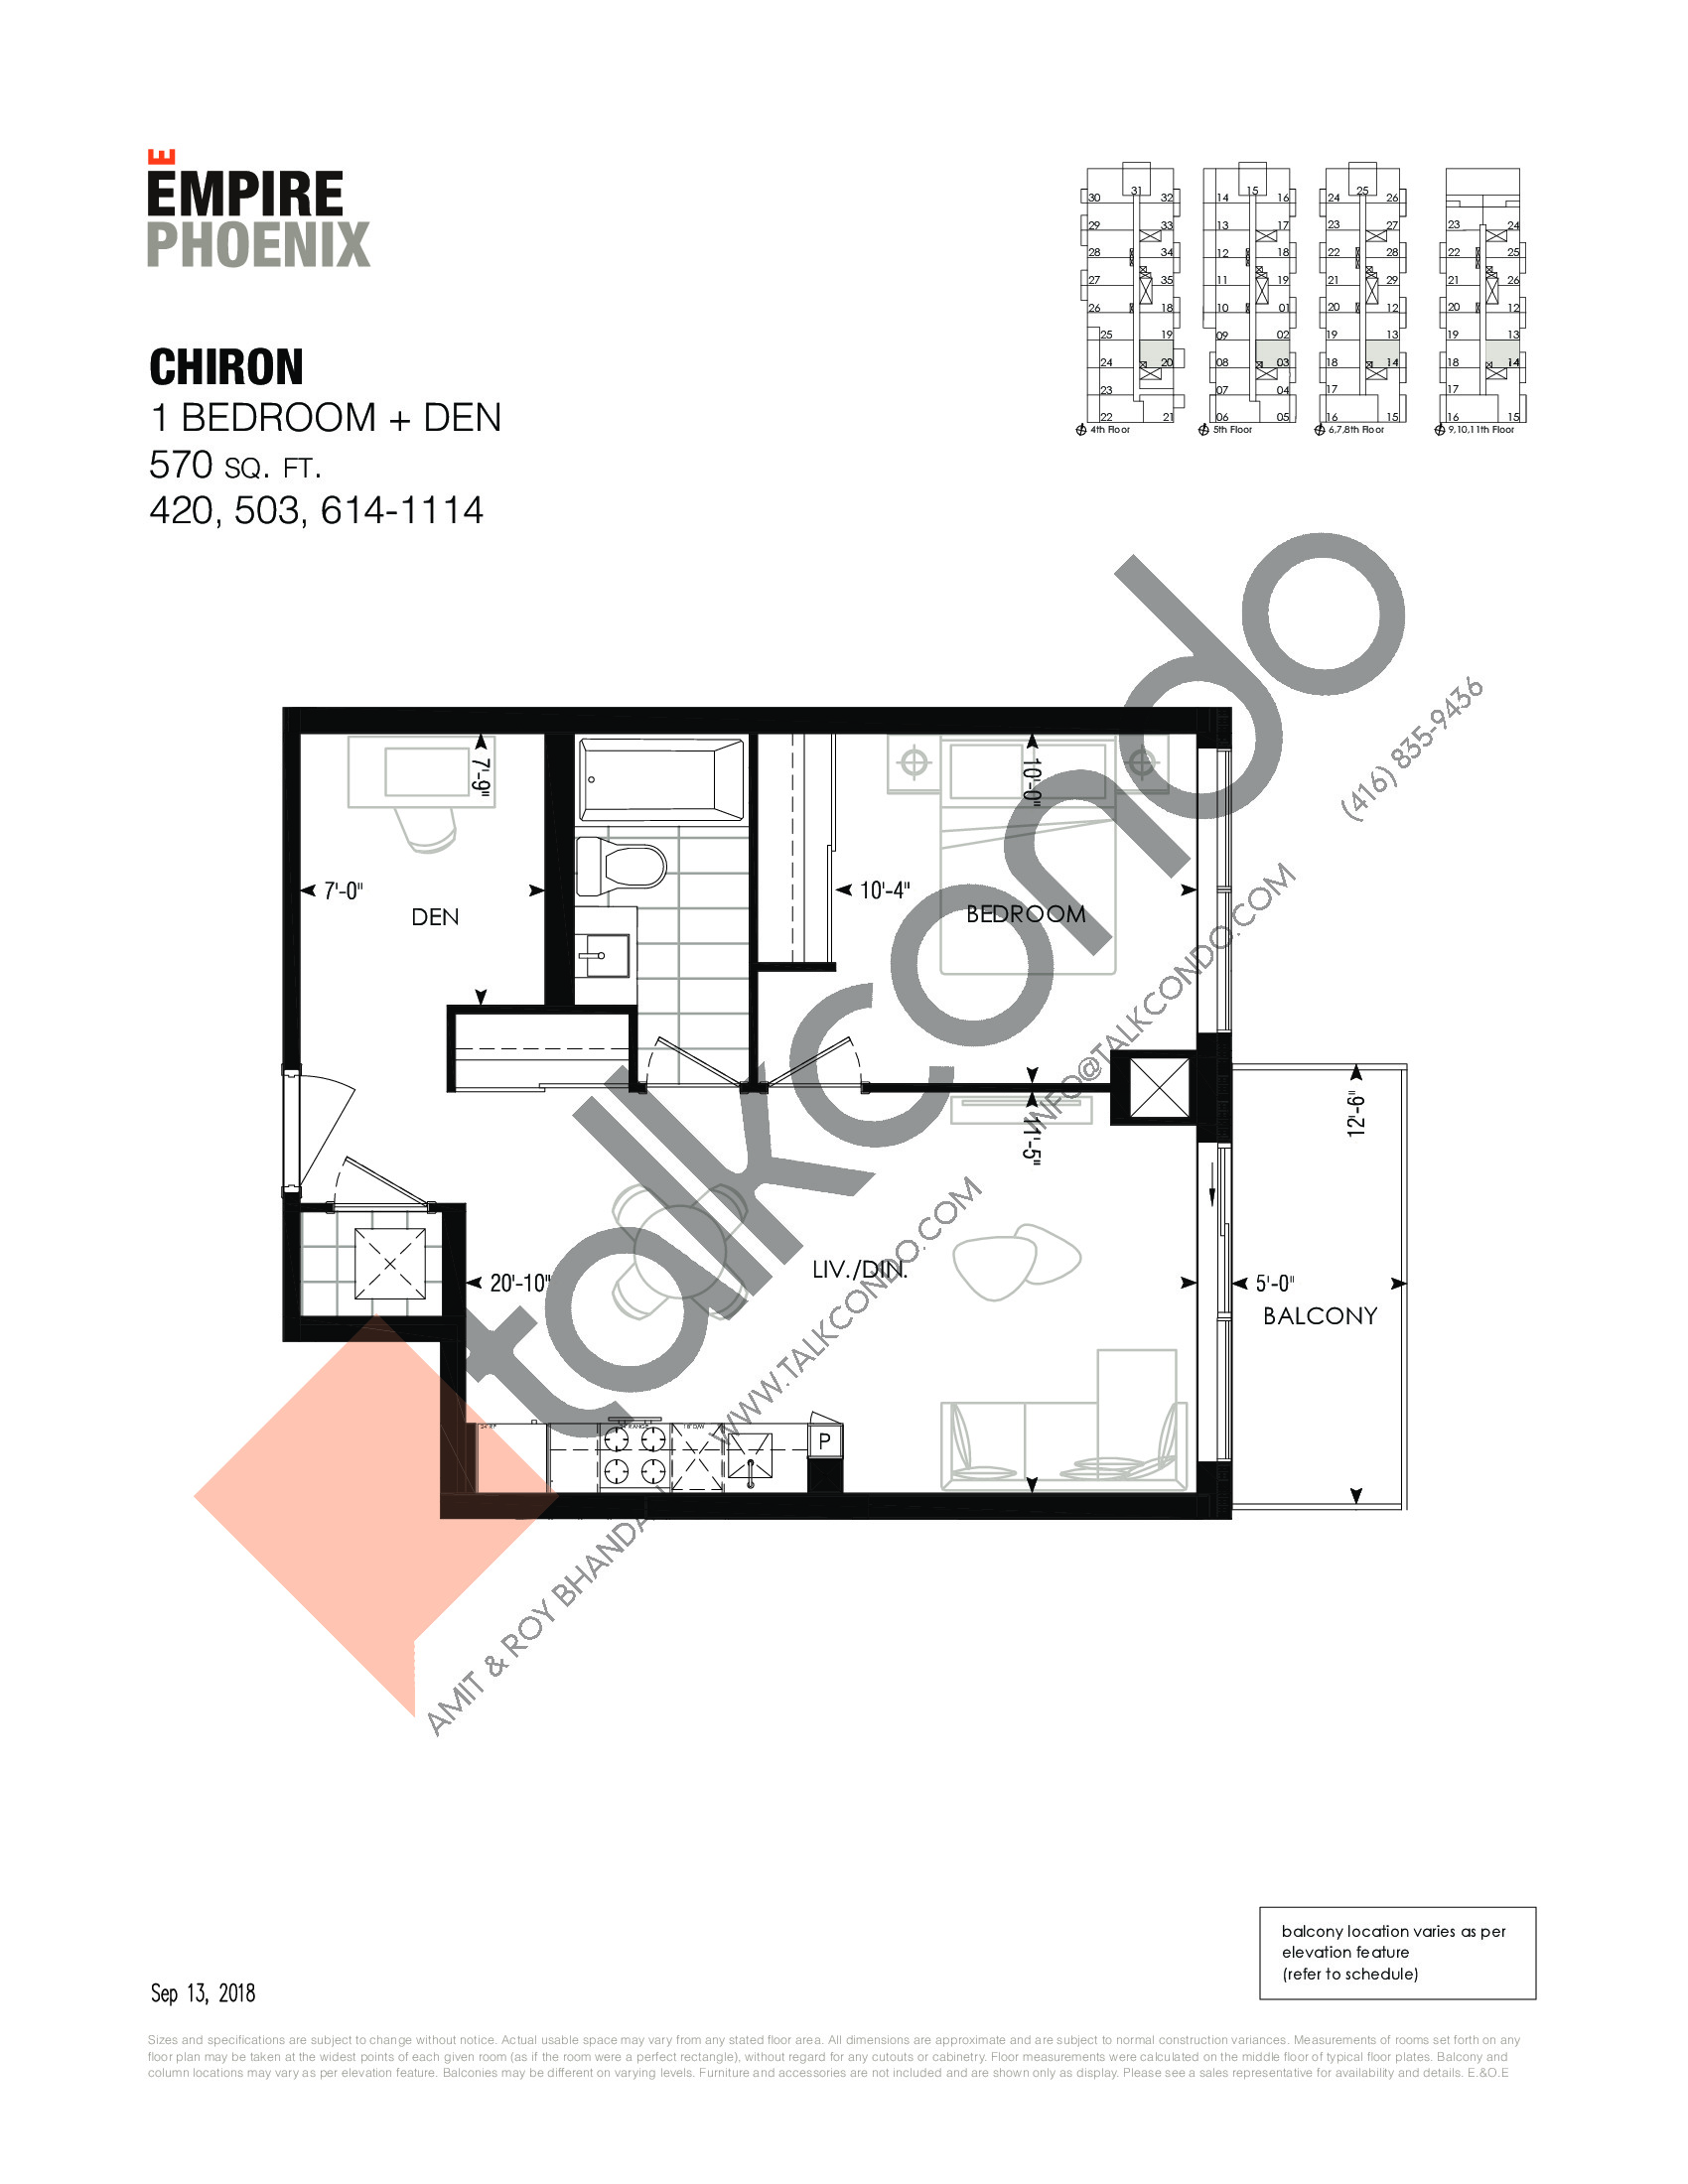 Chiron Floor Plan at Empire Phoenix Phase 2 Condos - 570 sq.ft